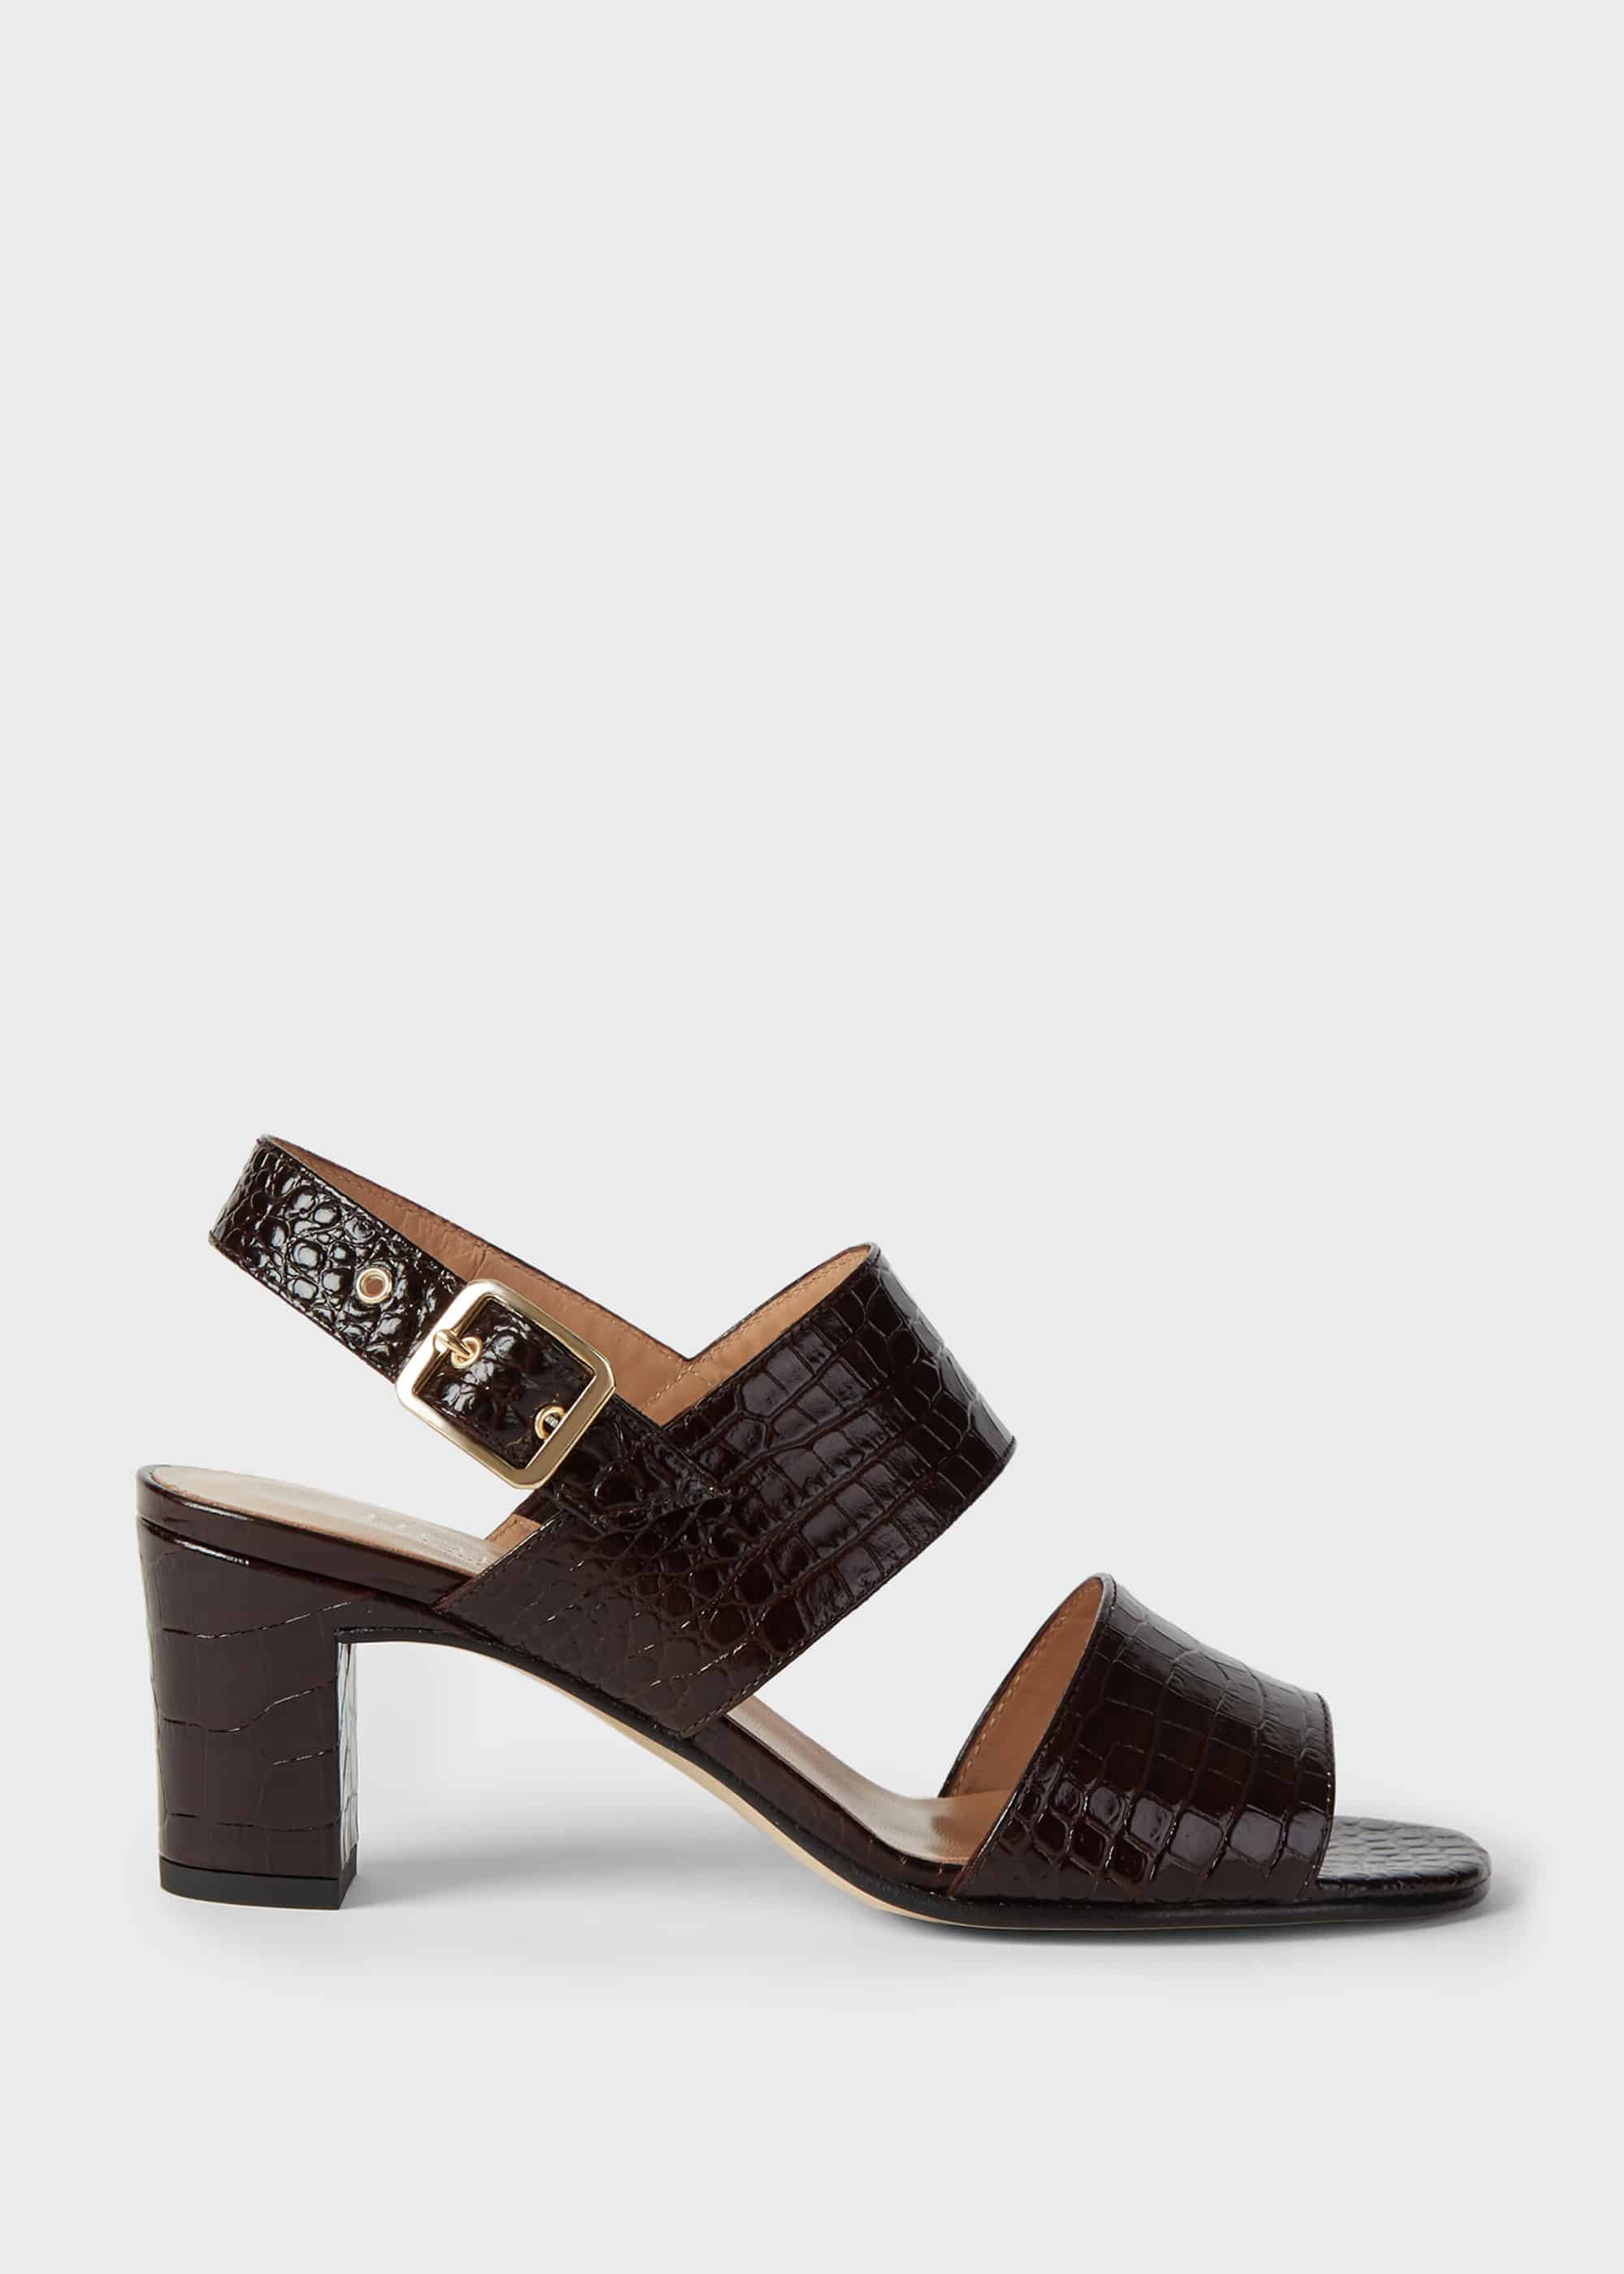 Hobbs Women Katrina Crocodile Block Heel Sandals